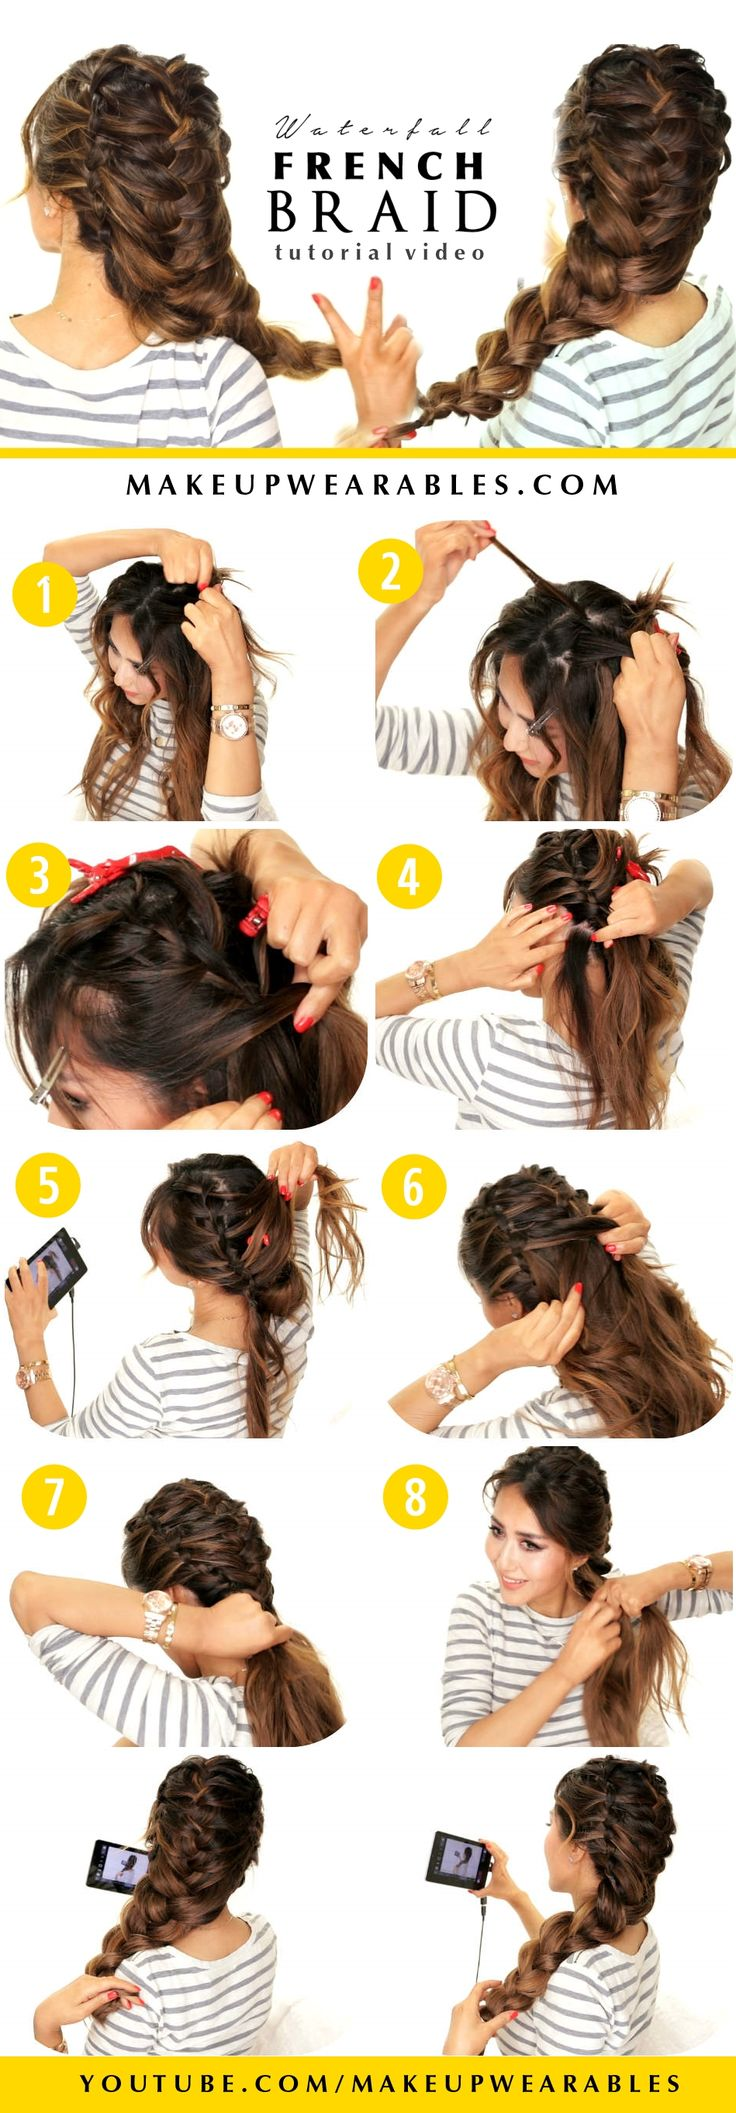 best wedding beauty hair images on pinterest braids